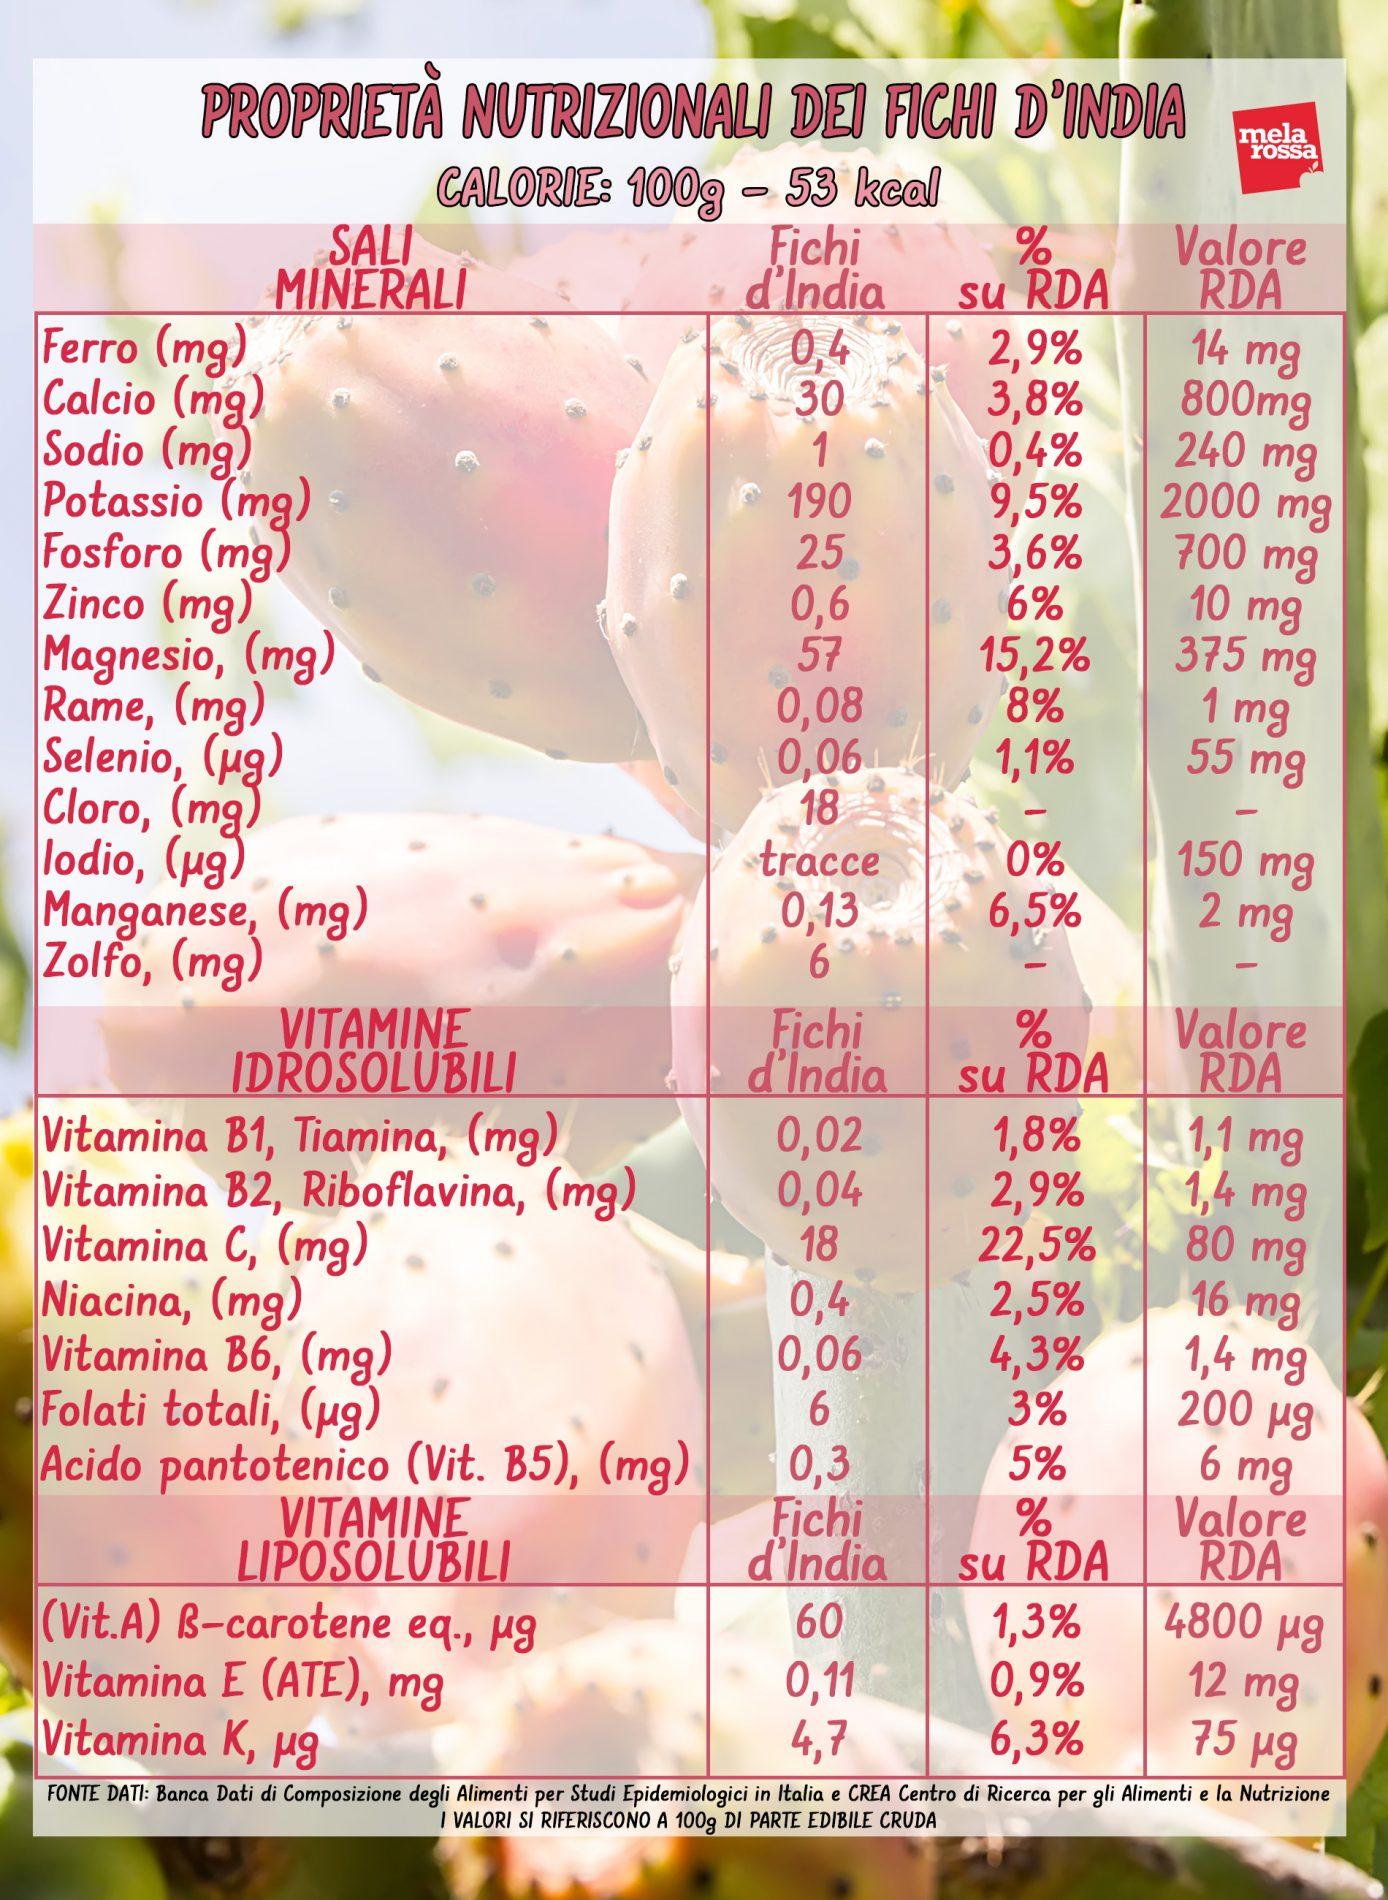 fichi d'India: valori nutrizionali